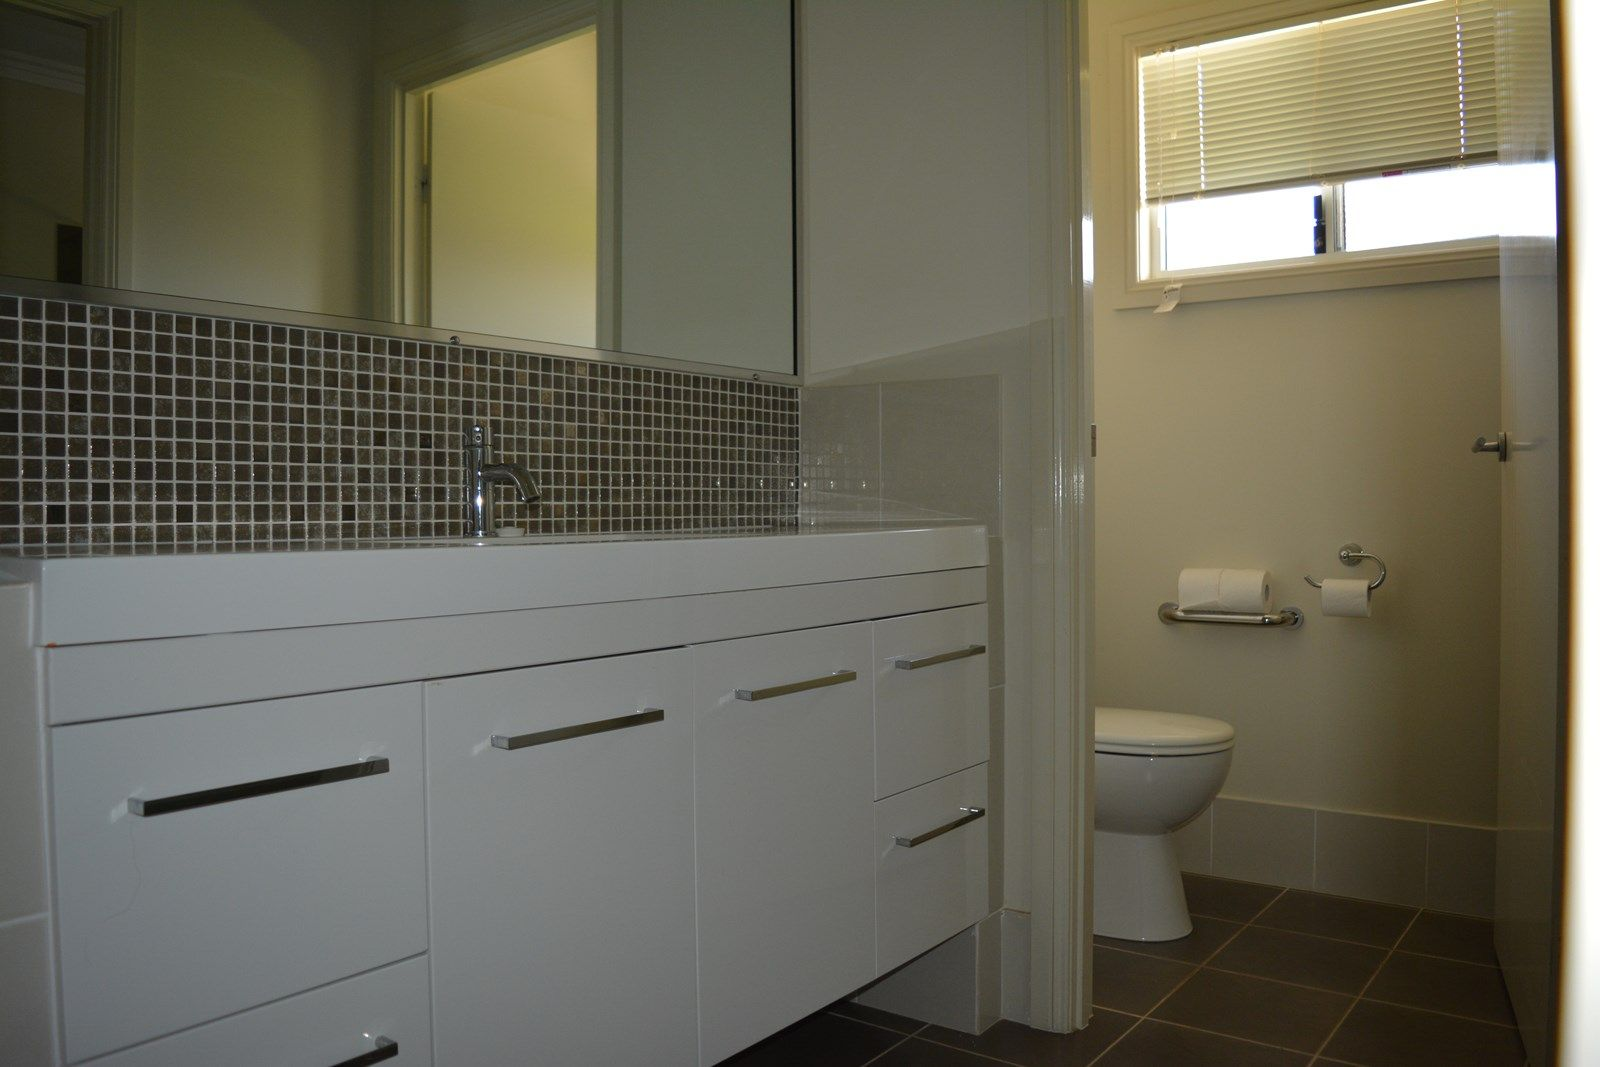 COTTAGE GWYDIR HIGHWAY, Moree NSW 2400, Image 1